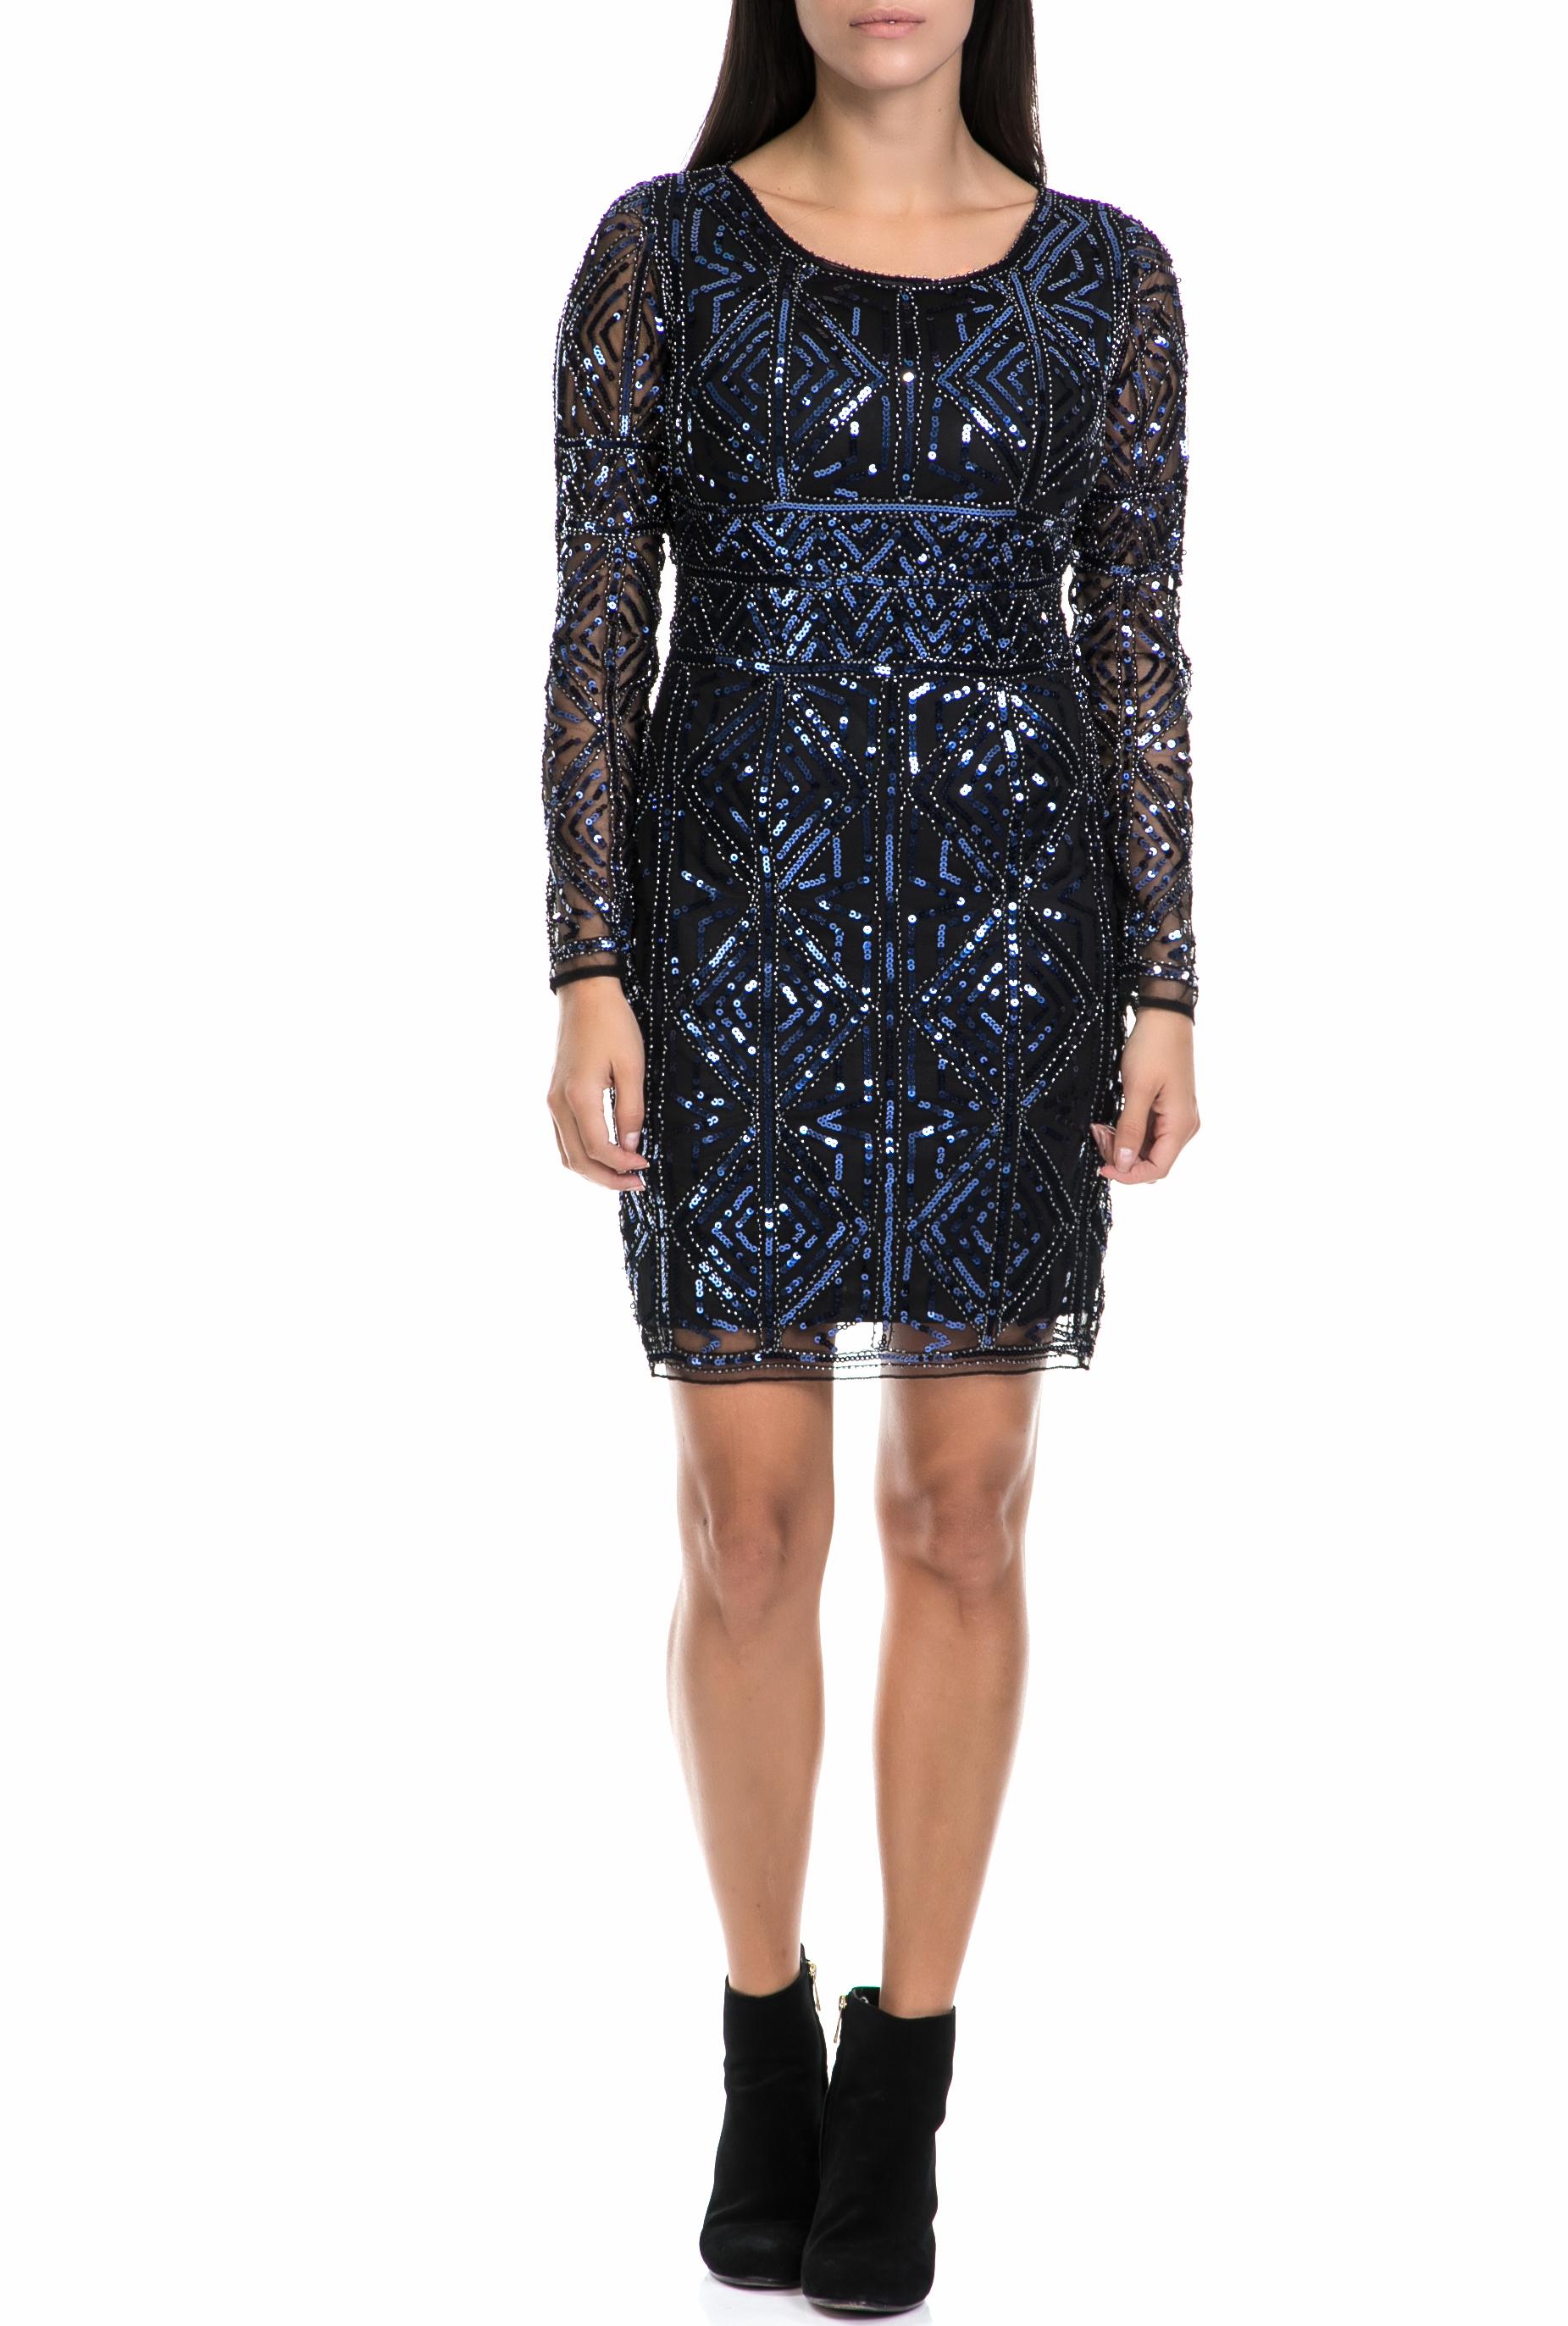 f5ebb13152b3 MOLLY BRACKEN – Γυναικείο φόρεμα MOLLY BRACKEN μπλε